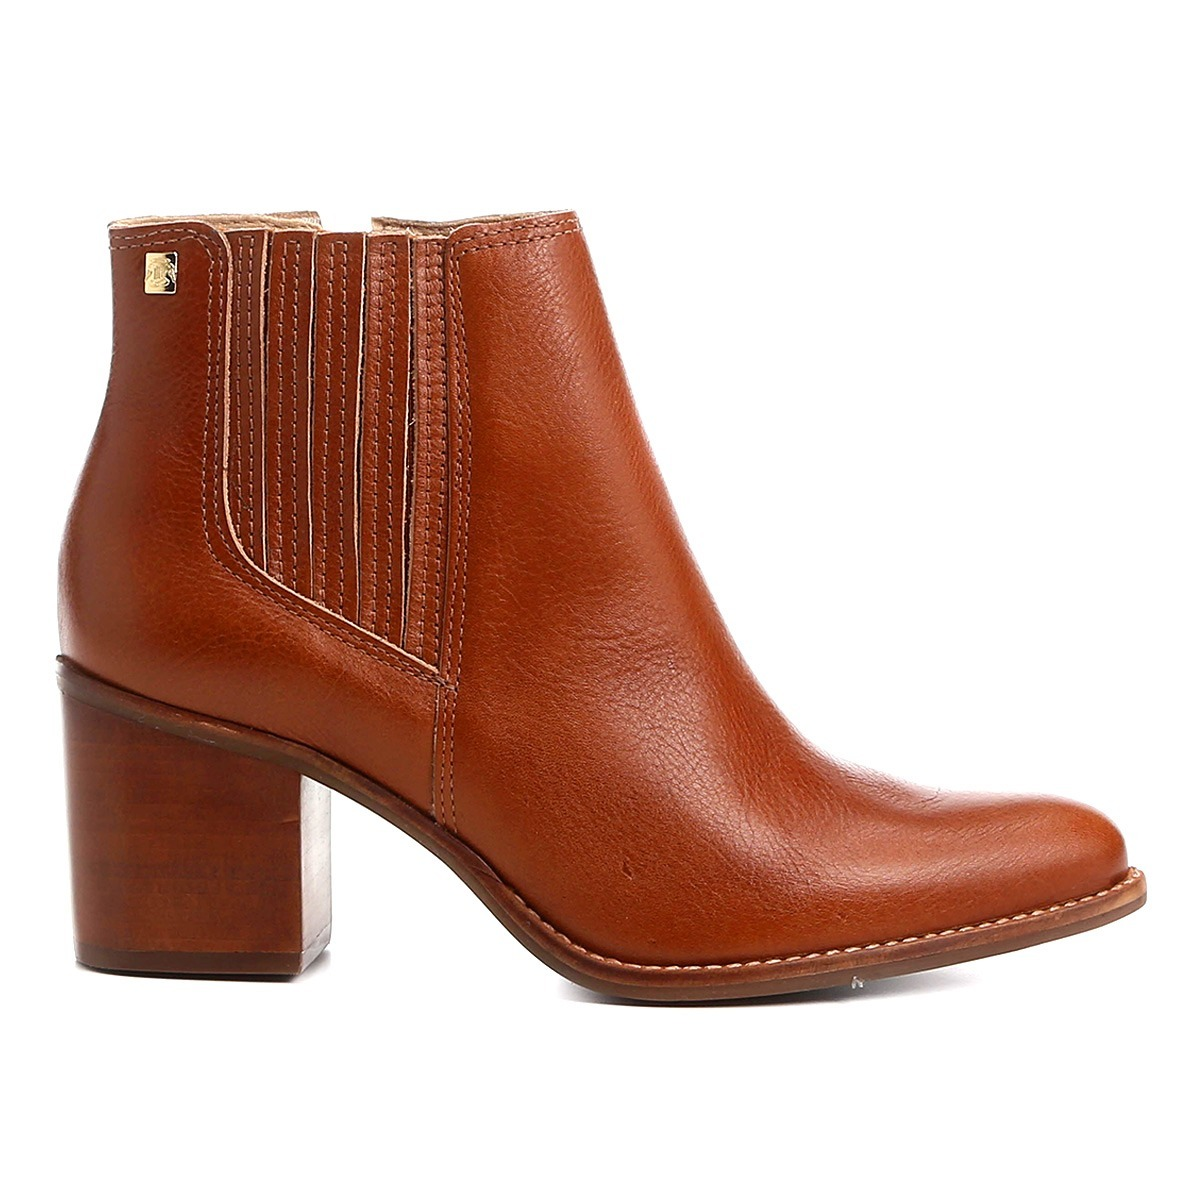 ca6396ebec bota cano curto loucos   santos na cor caramelo - 510710. Carregando zoom.